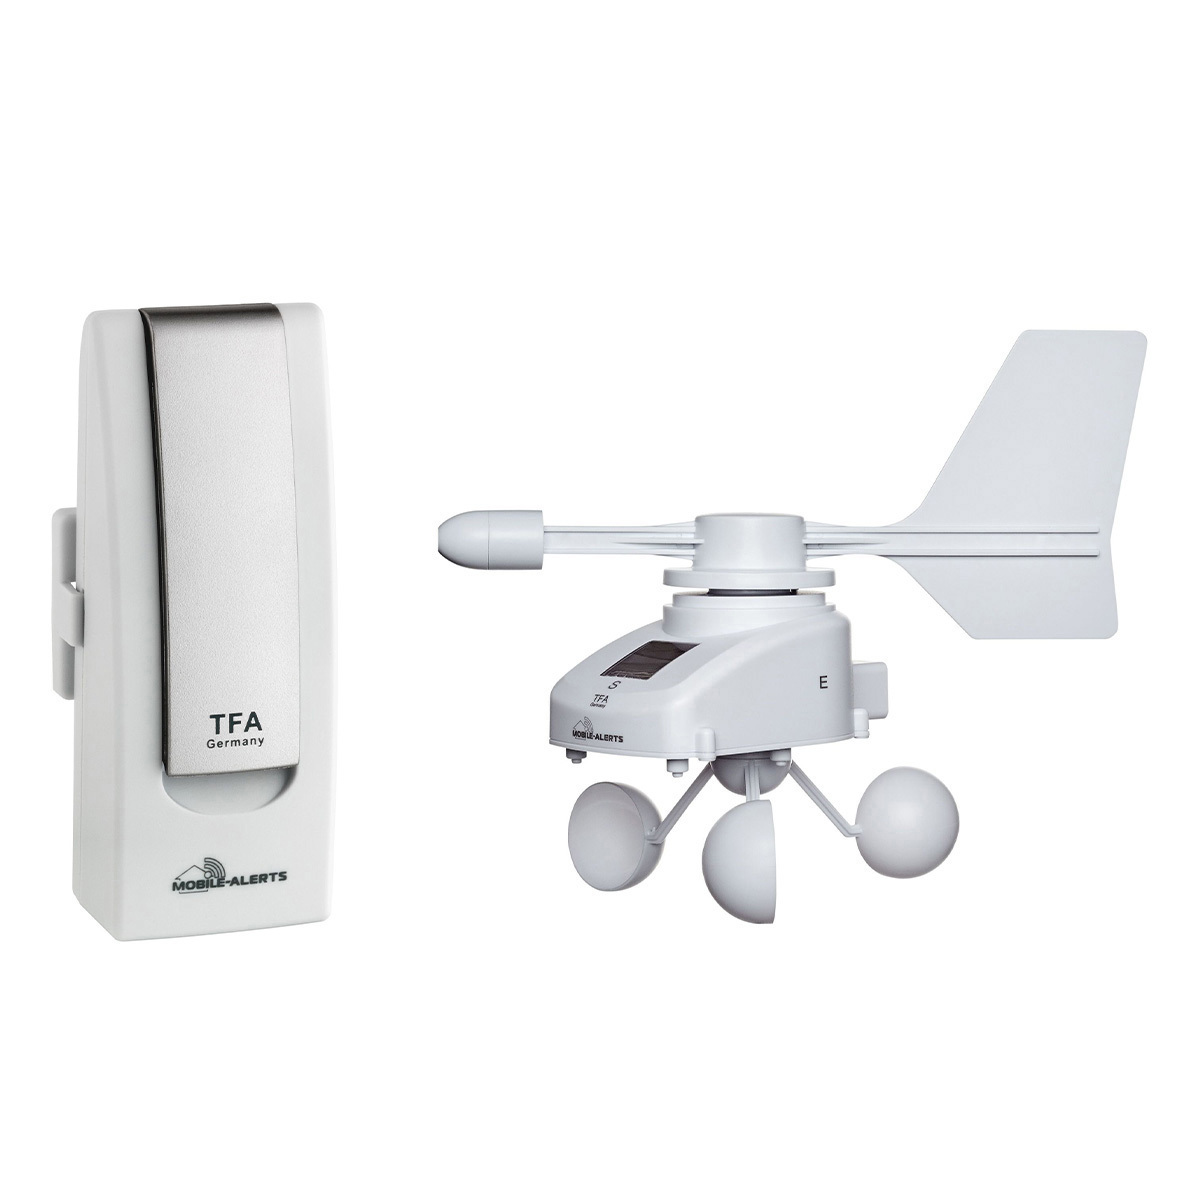 31-4006-02-starter-set-mit-funk-windmesser-weatherhub-sender-1200x1200px.jpg